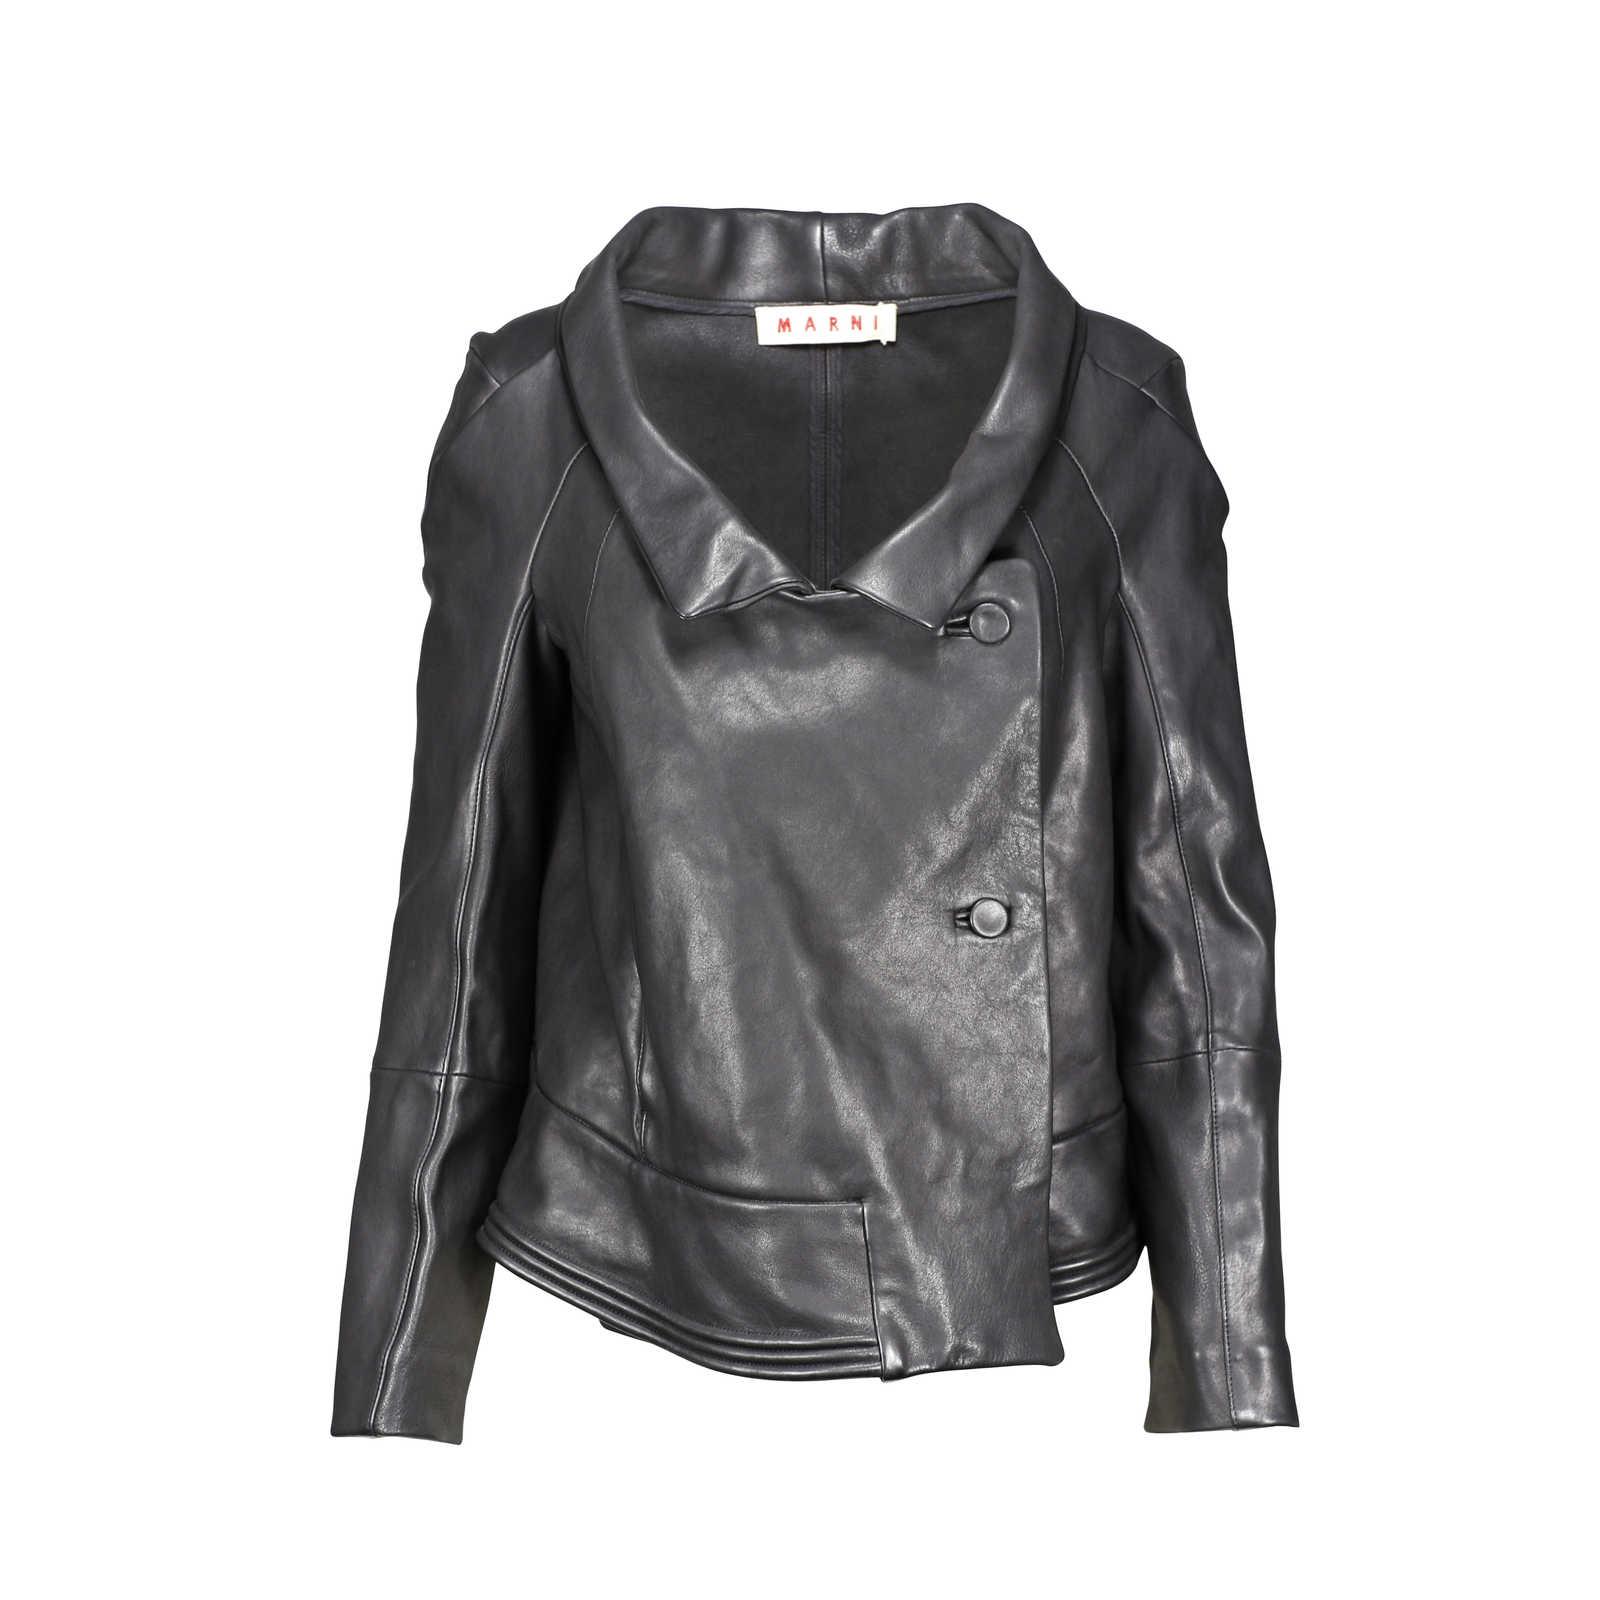 marni-leather-wrap-jacket-pss-179-00001-1.jpg